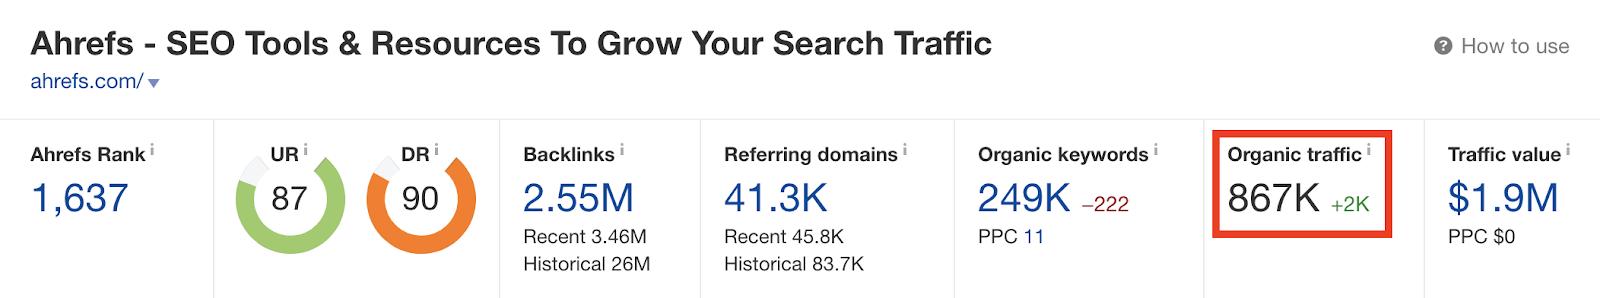 Ahrefs Organic Search Data